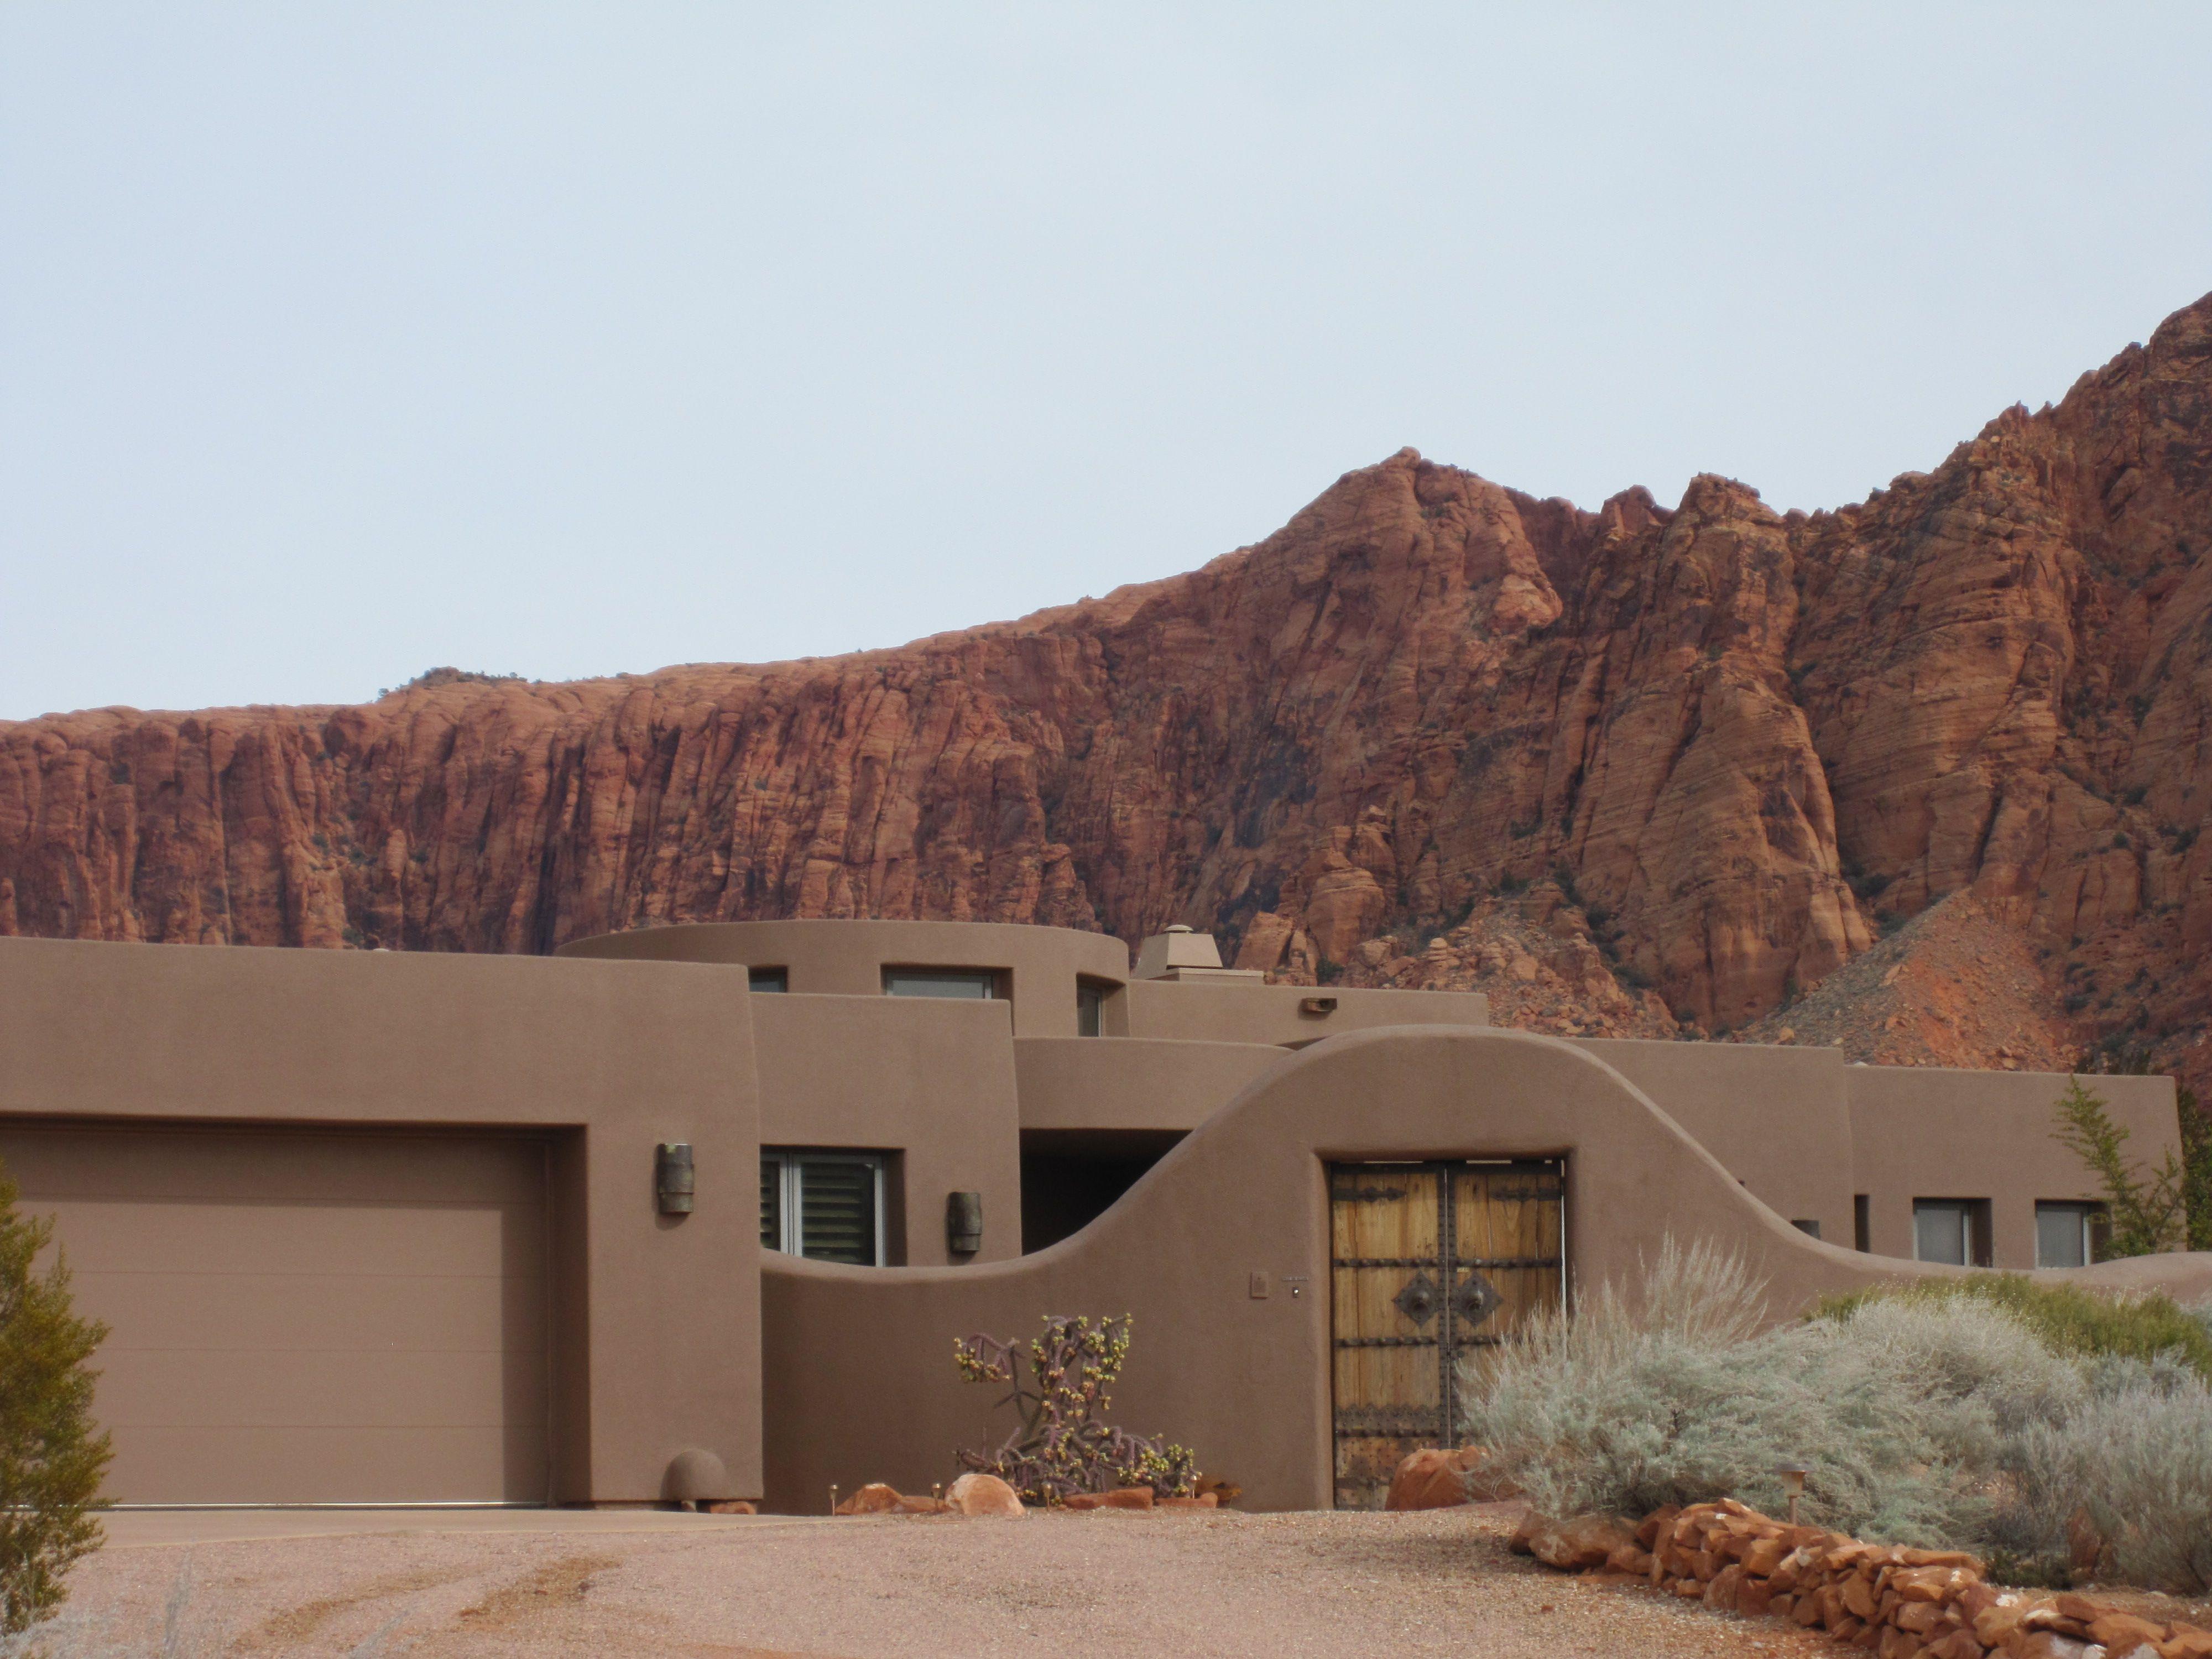 Another Gorgeous Southwestern Style Home In Kayenta Desert Community Desert Homes St George Utah Southwestern Home